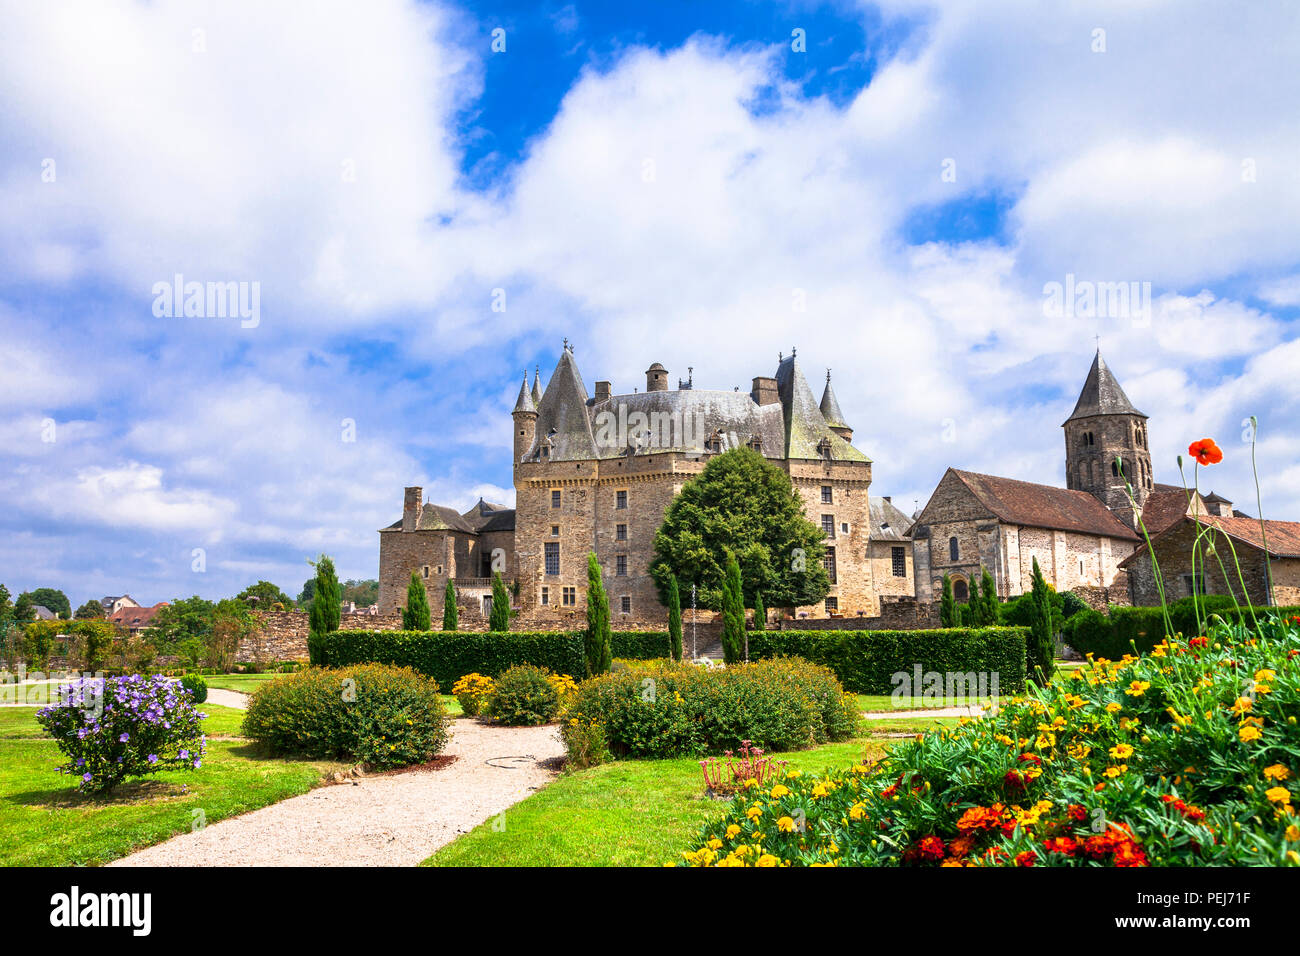 Elegant Jumilhac le grand medieval castle,France. - Stock Image